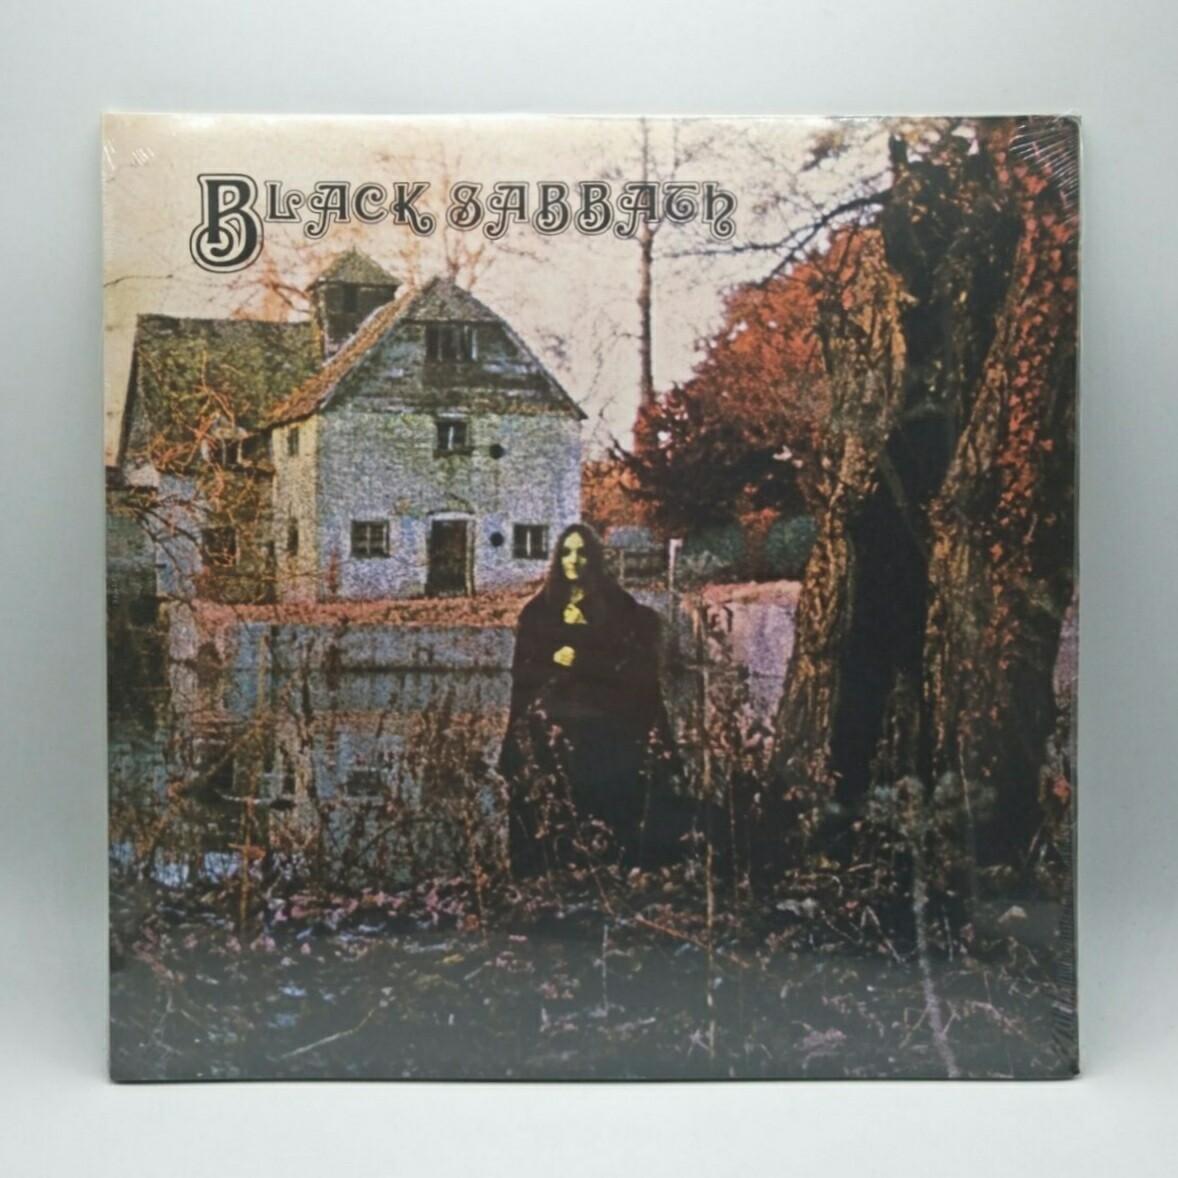 BLACK SABBATH -S/T- LP (180 GRAM VINYL)